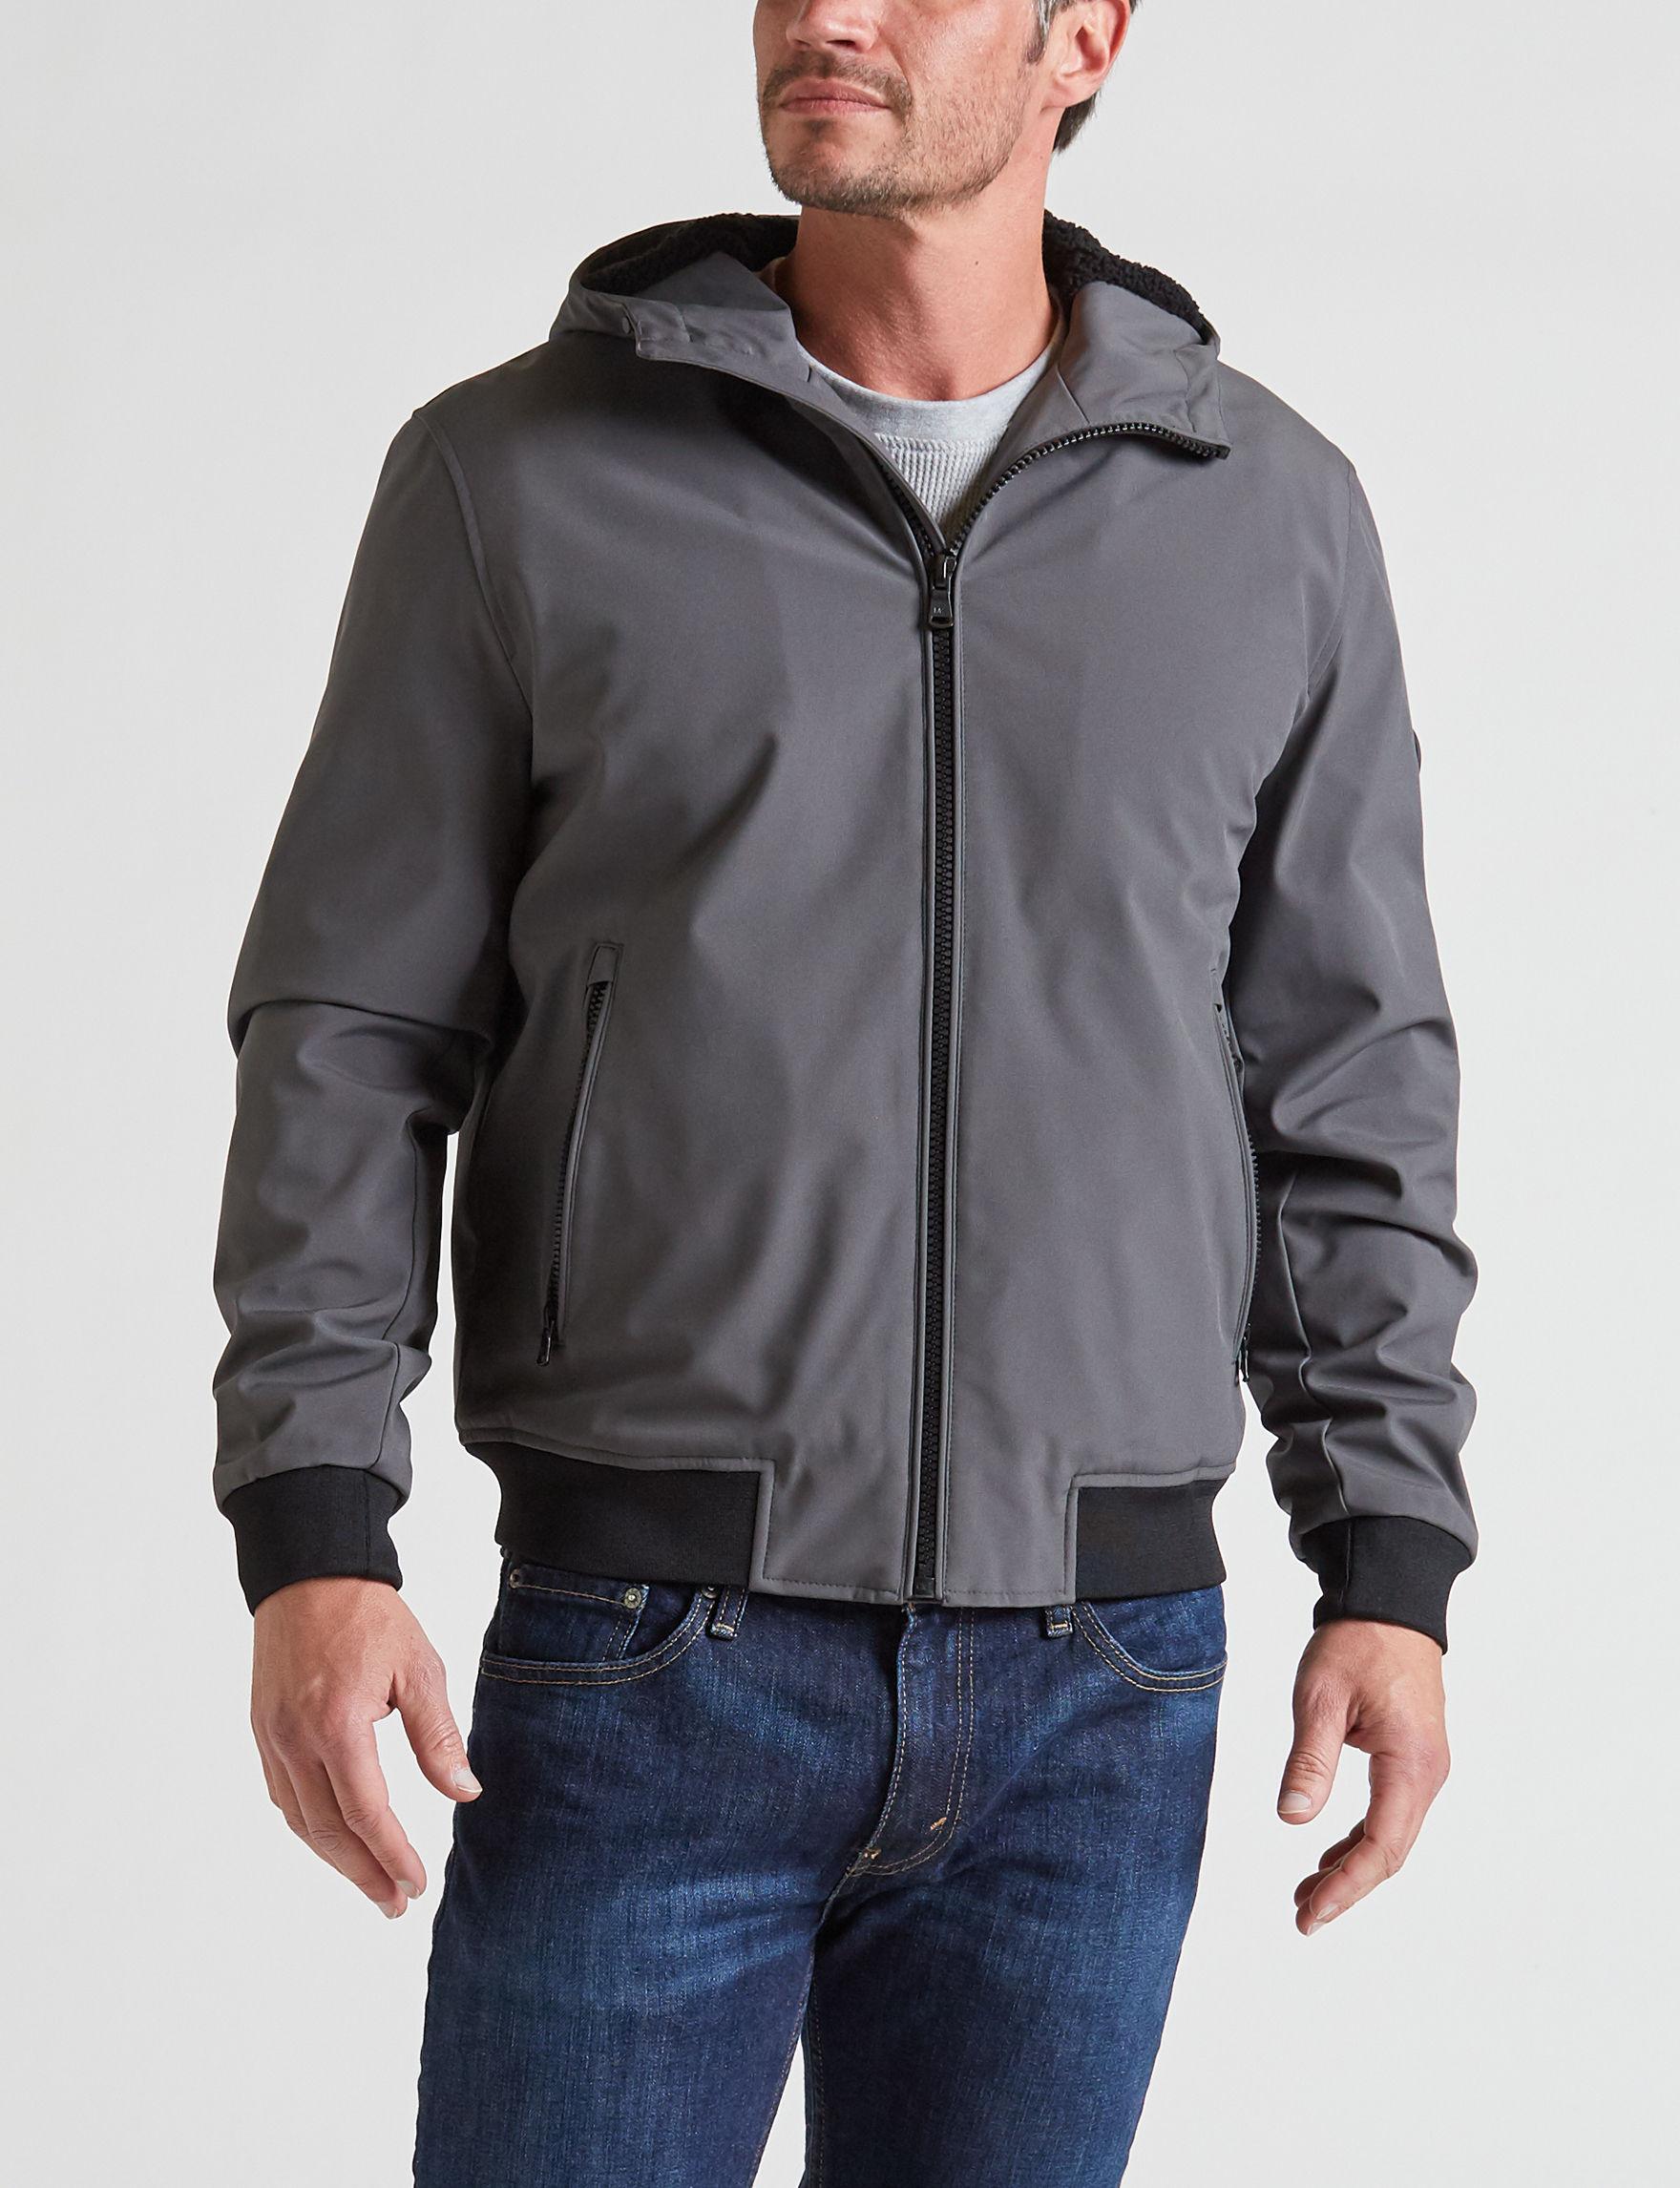 Michael Kors Dark Grey Fleece & Soft Shell Jackets